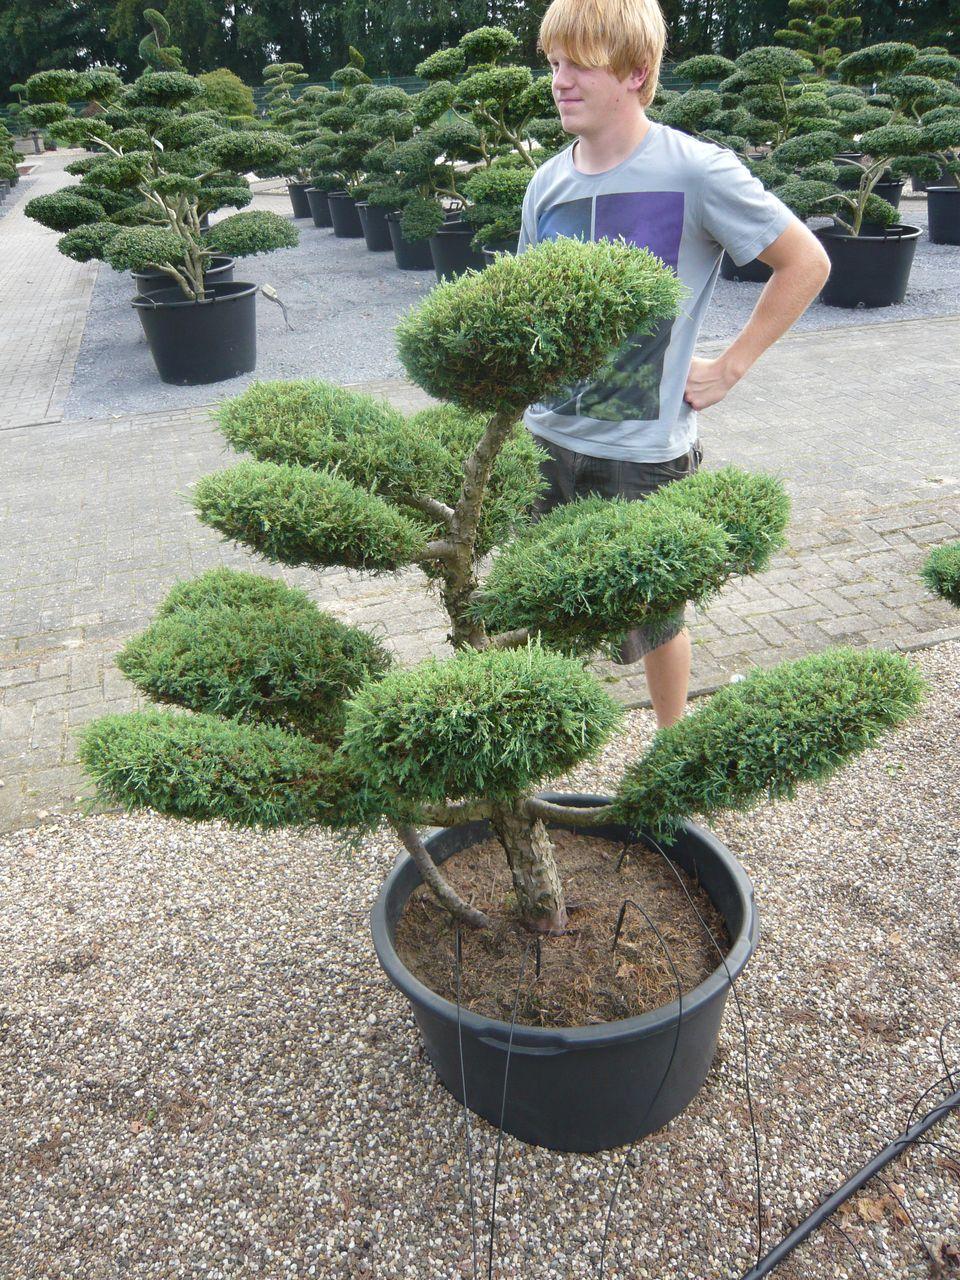 Pflanzenspecial gartenbonsai kostbarkeiten japans for Garten planen mit bonsai acer